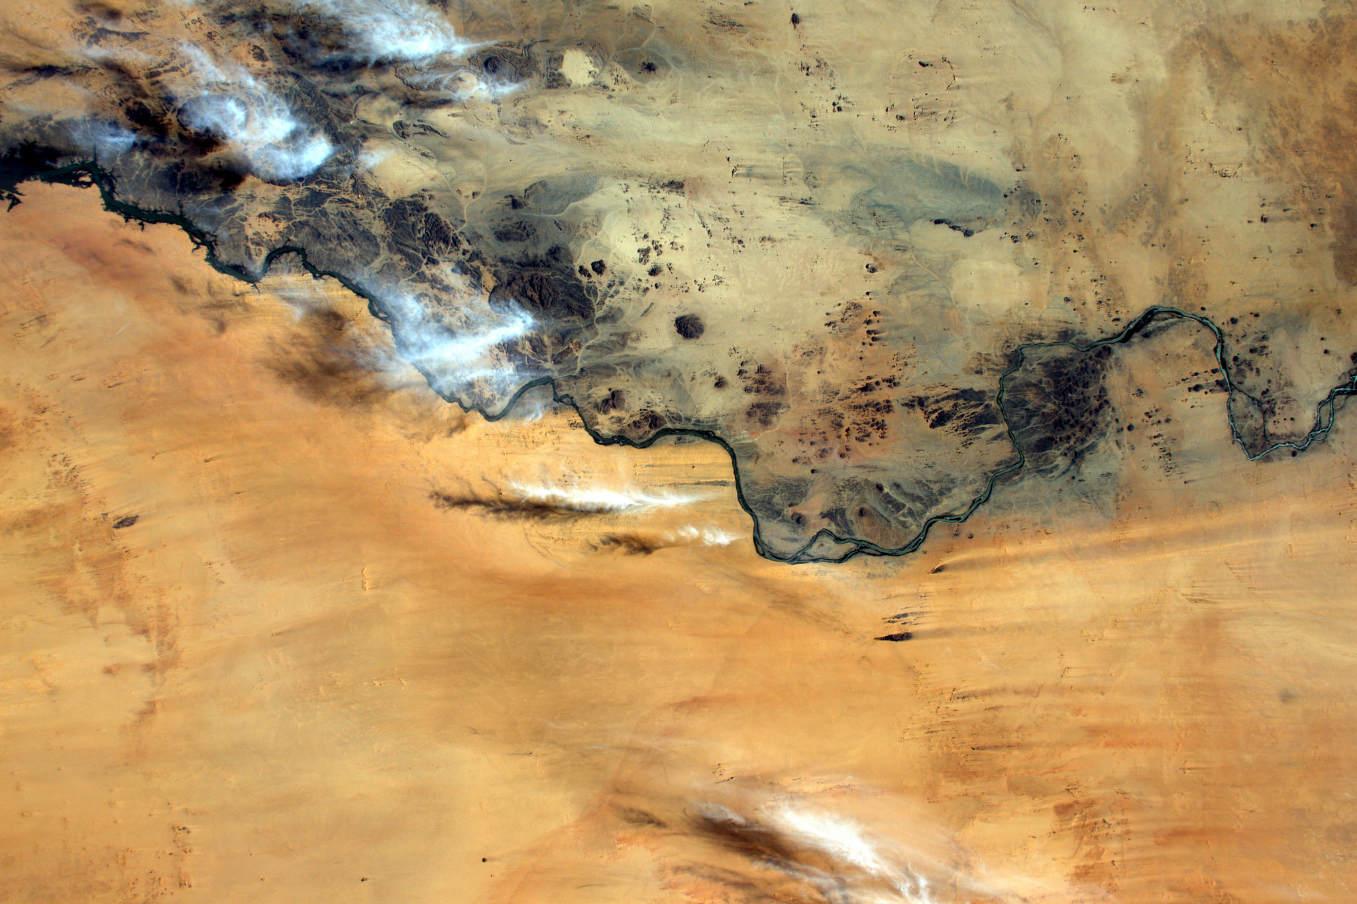 La Terre dans l'oeil de Thomas Pesquet #40 : entre Semna, Amara et Kokka